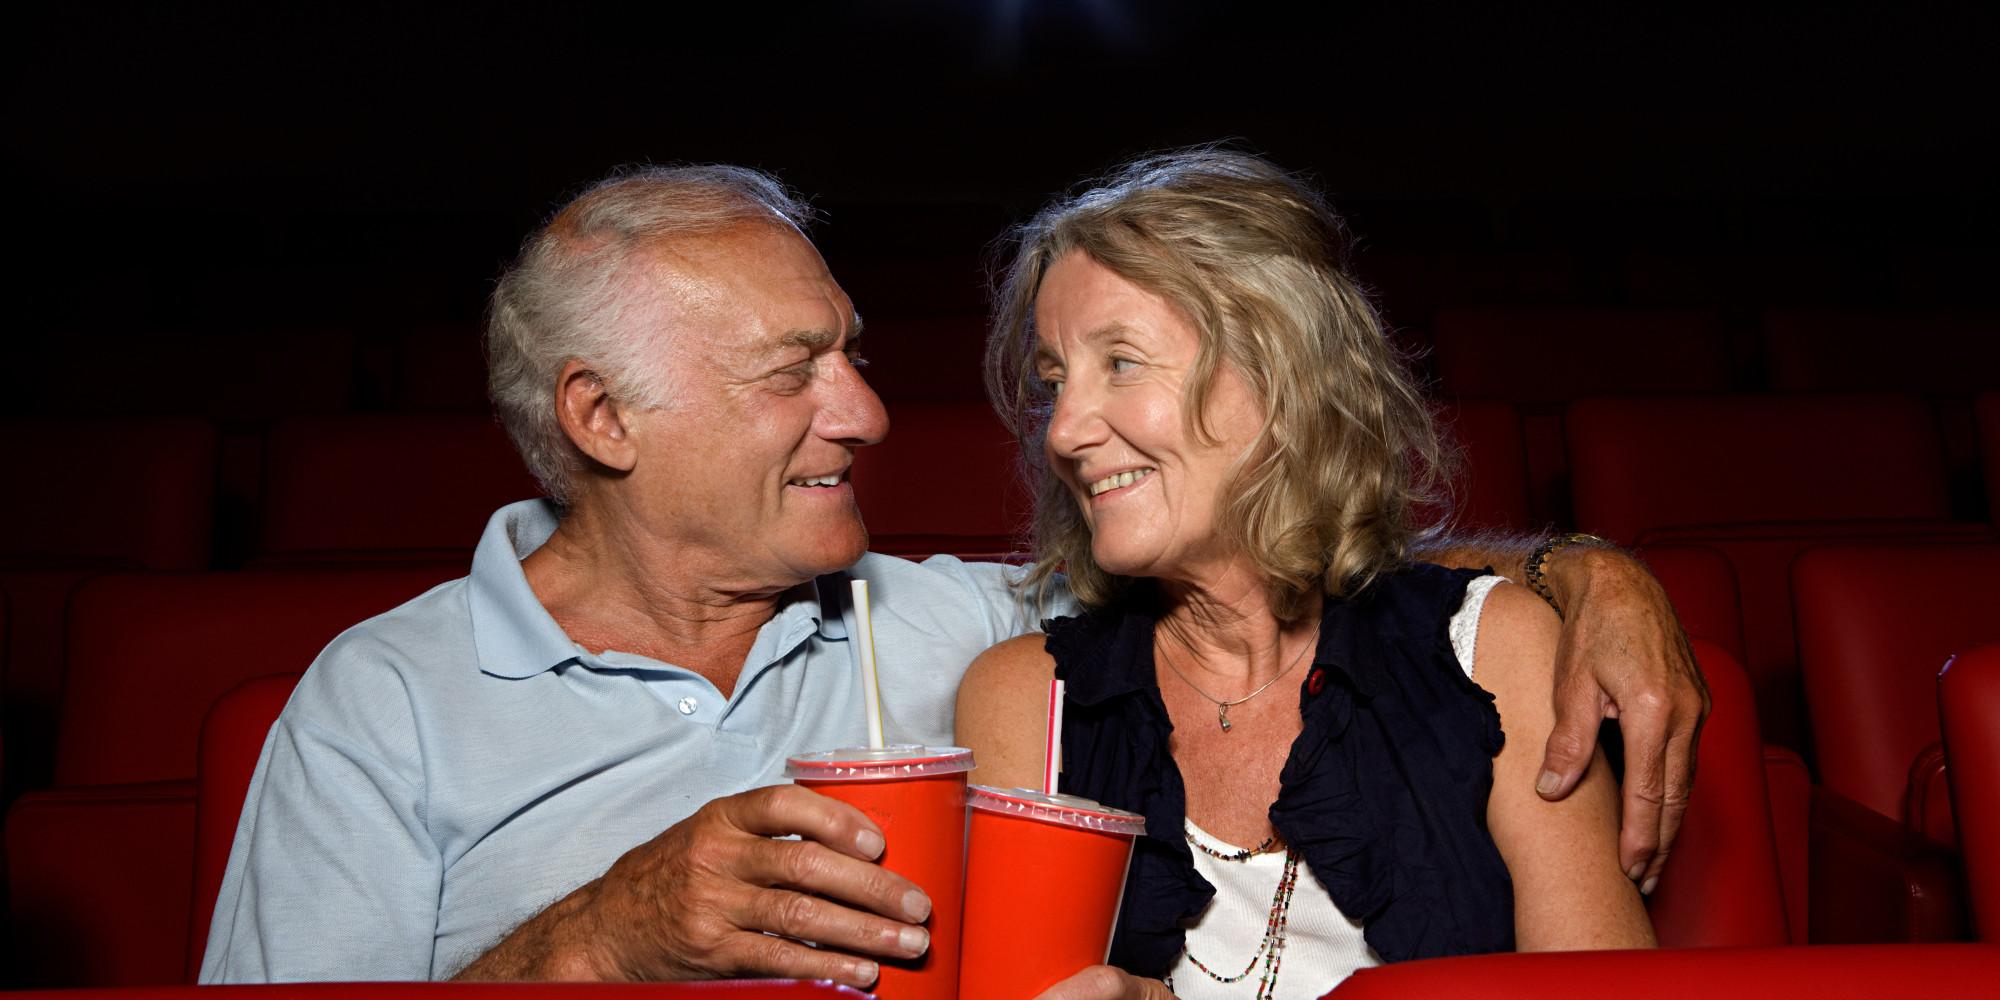 old folks dating